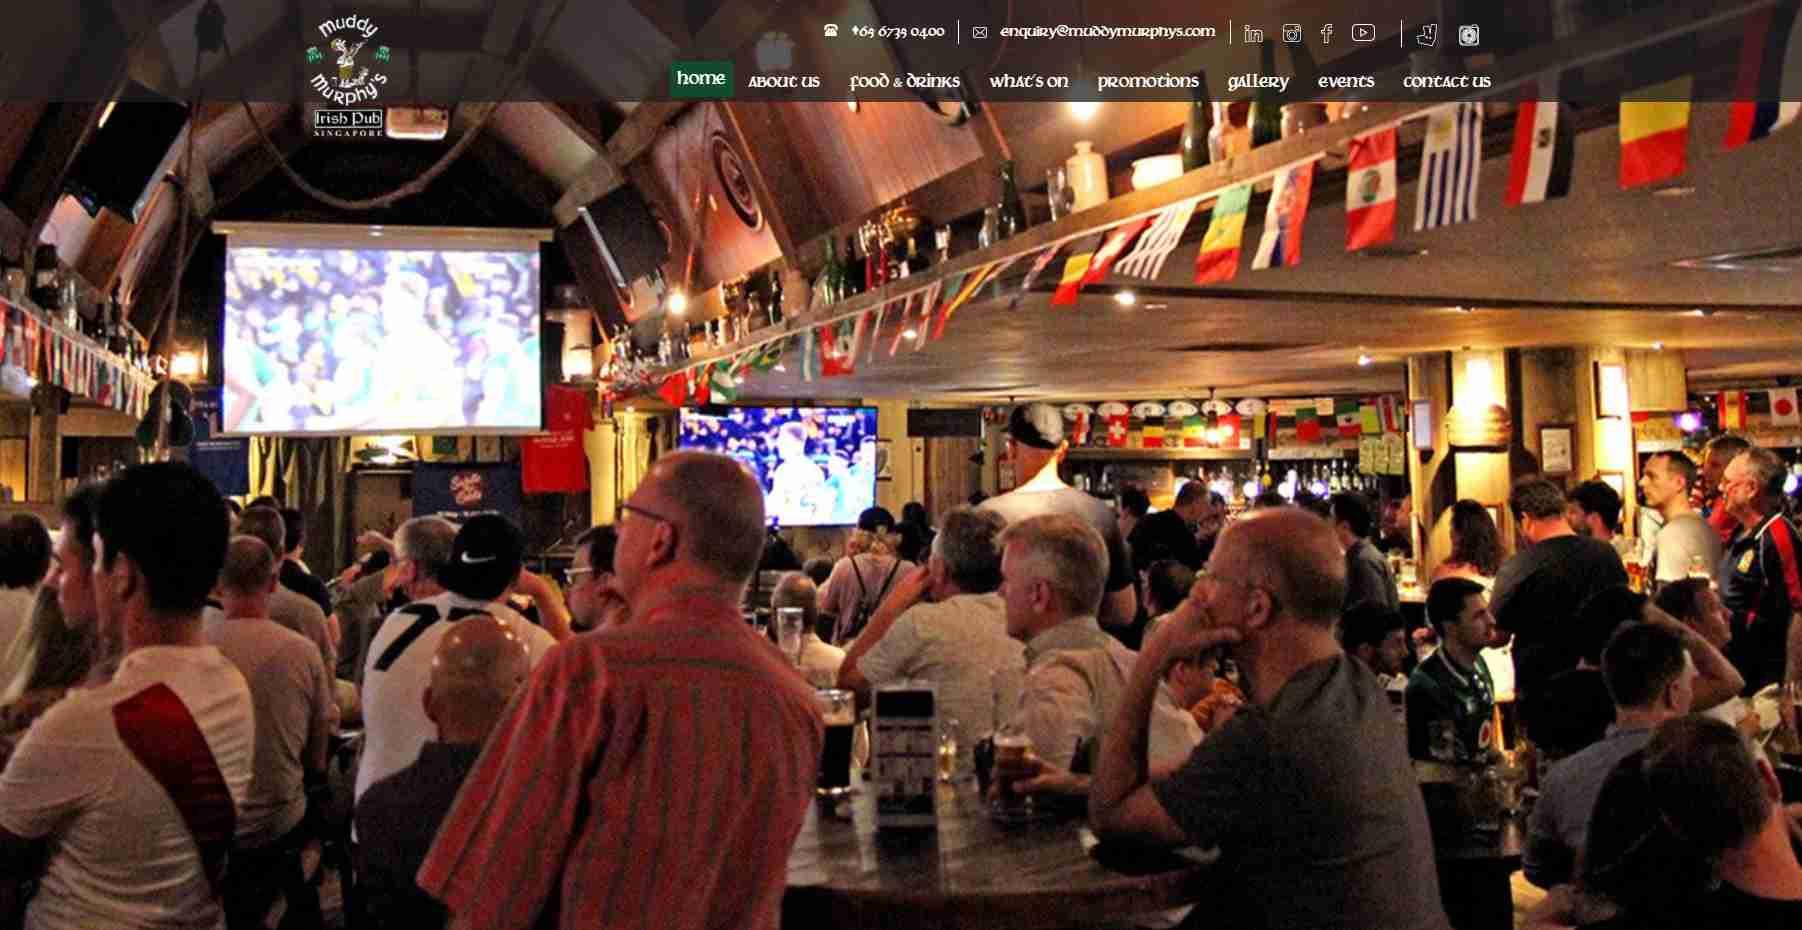 muddy murphys Top Pubs In Singapore